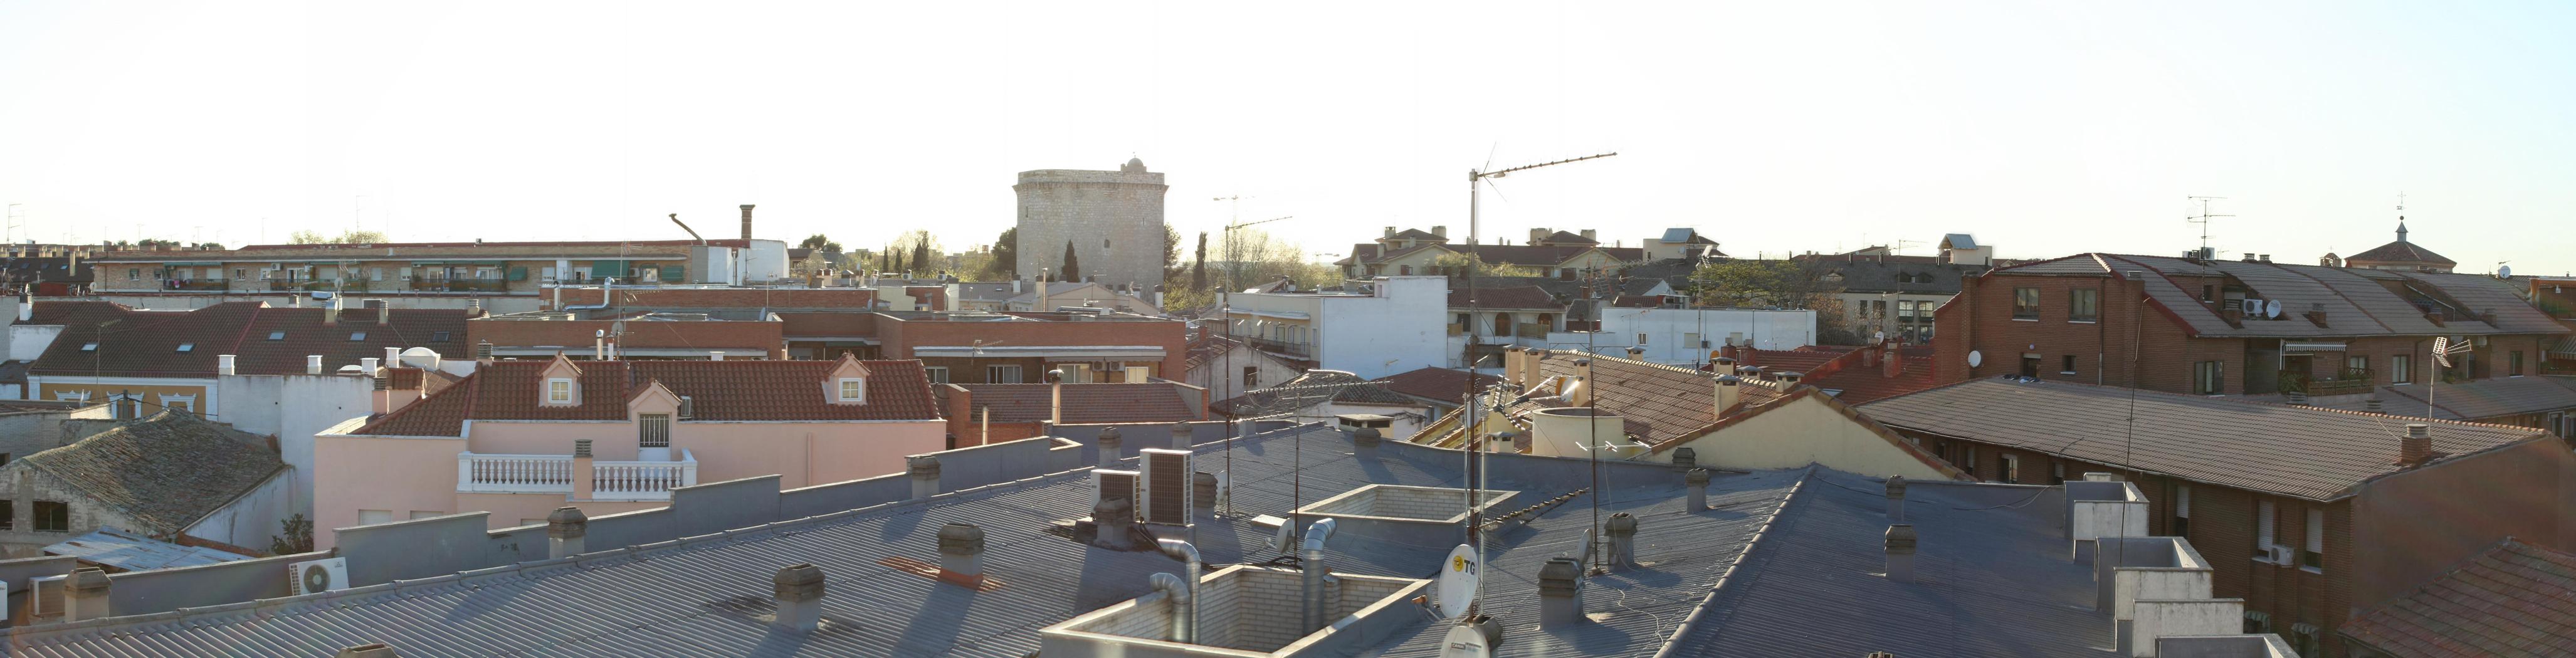 Pinto, Madrid